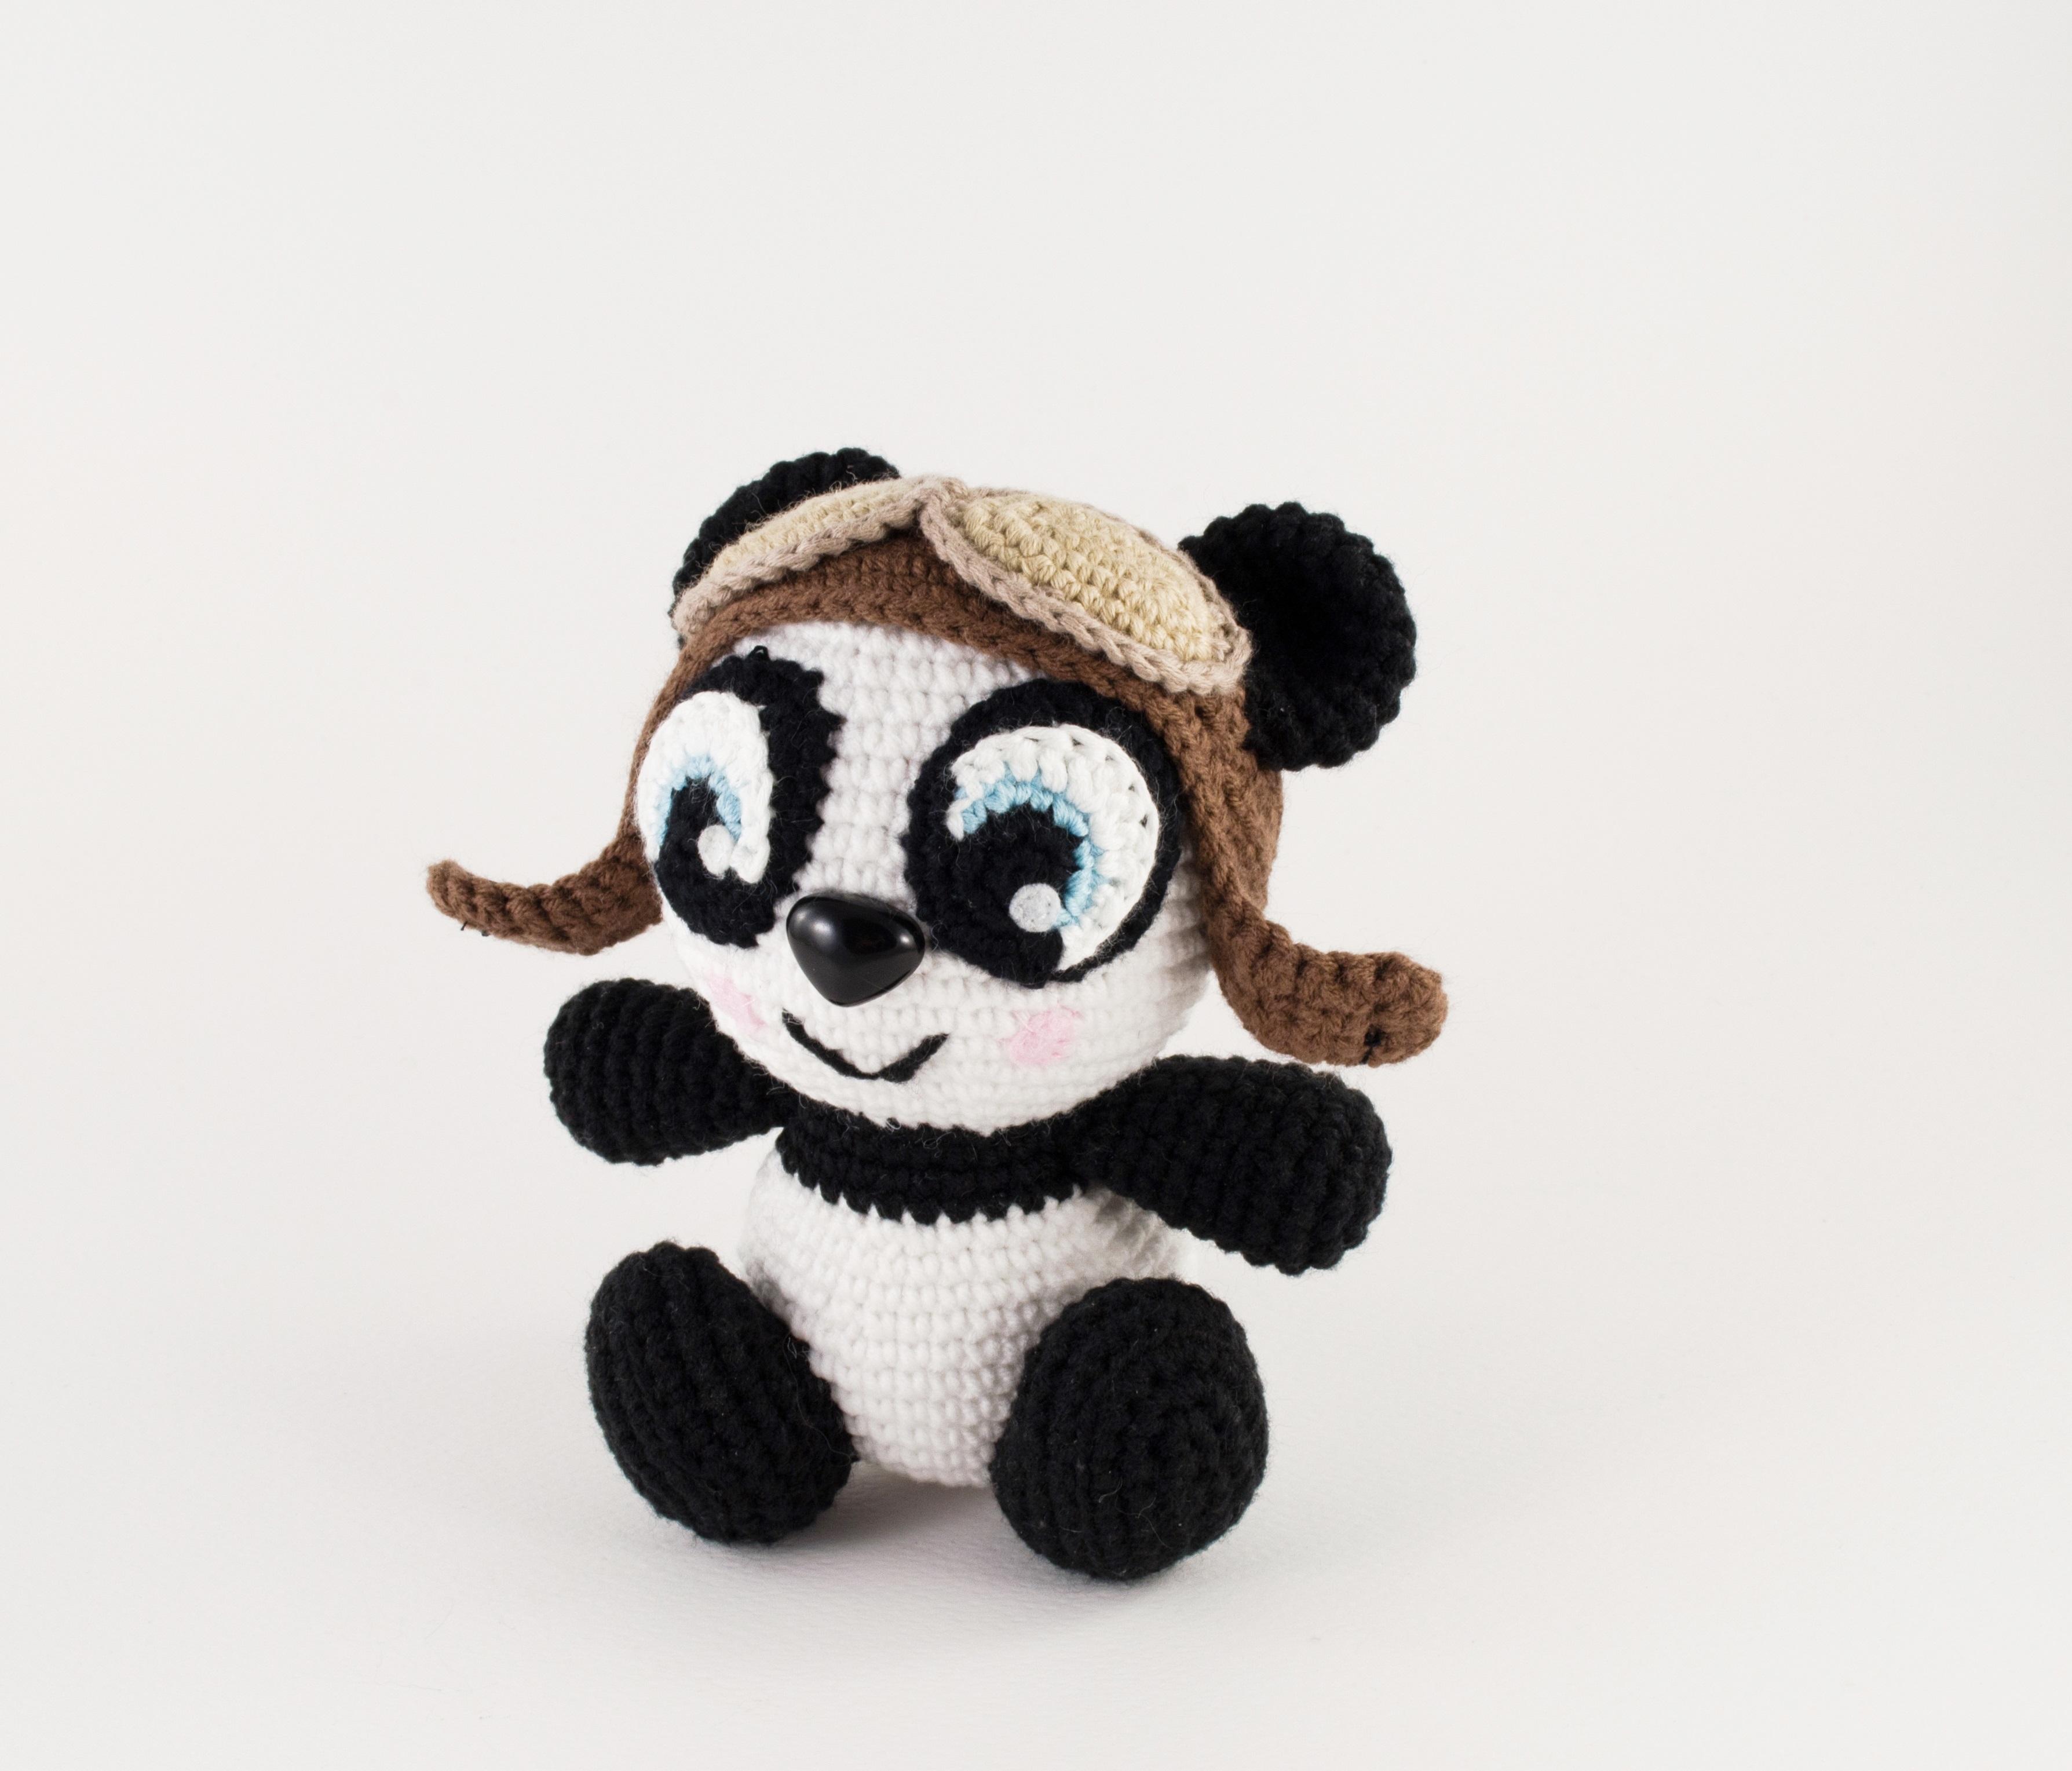 crochet panda front view